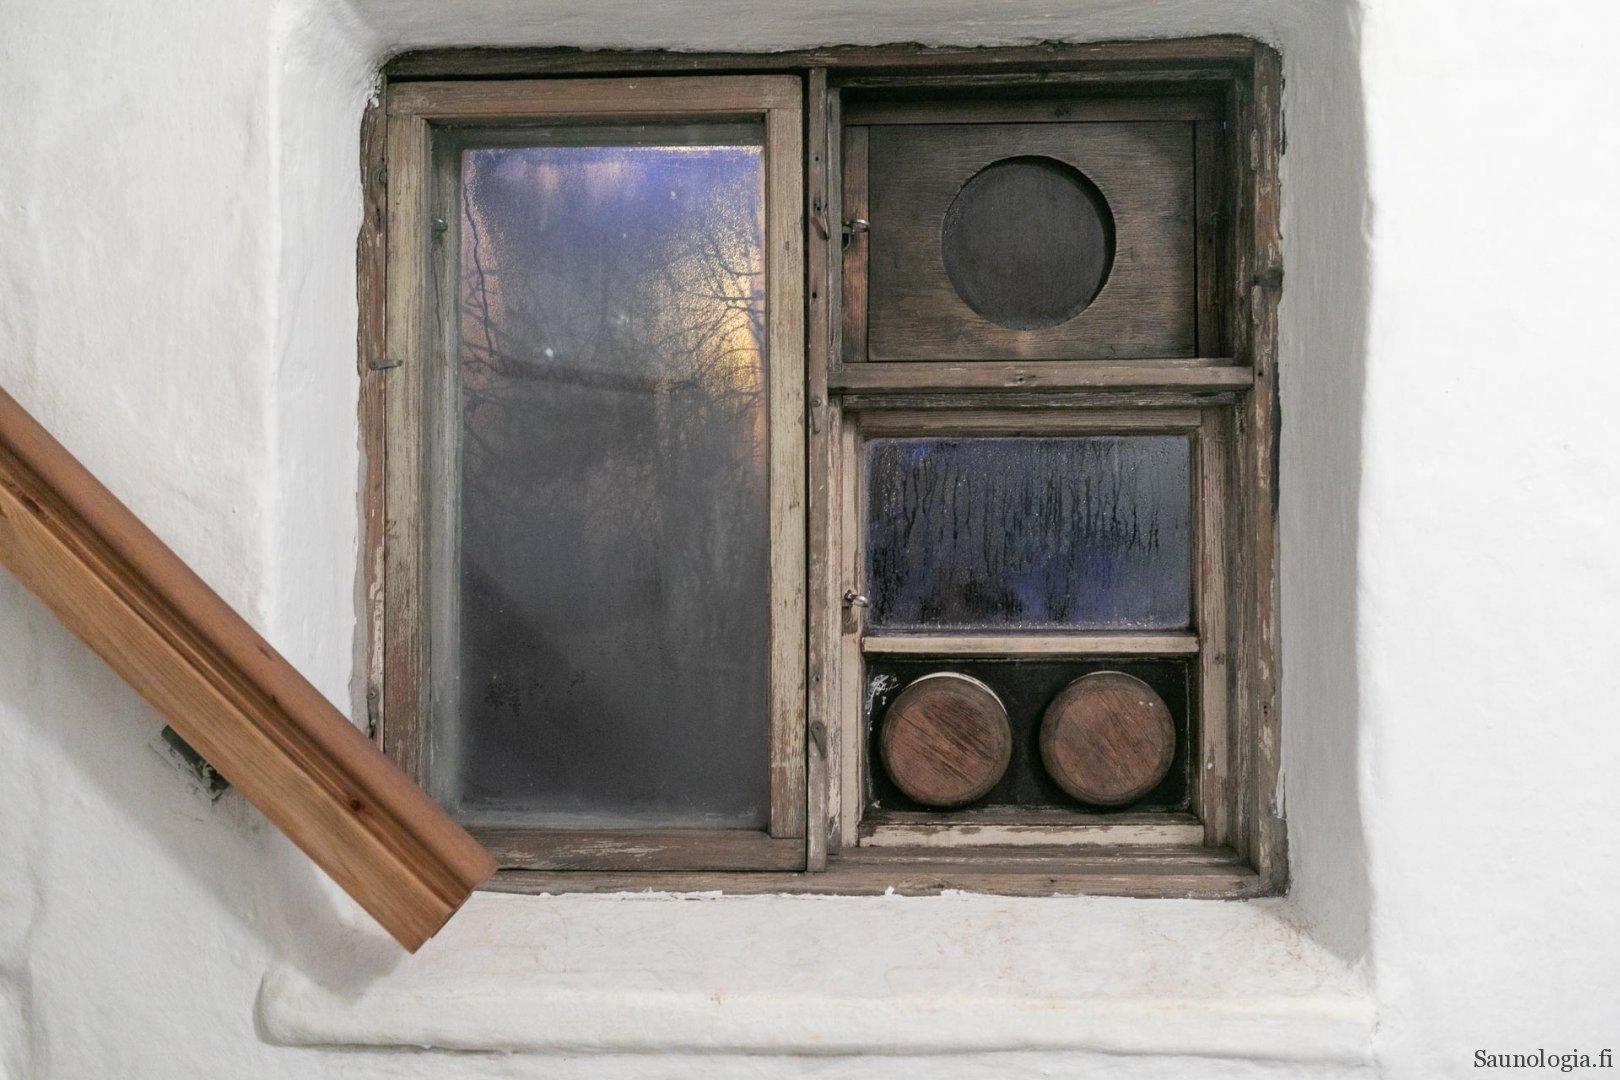 Rajaportin saunan ikkuna